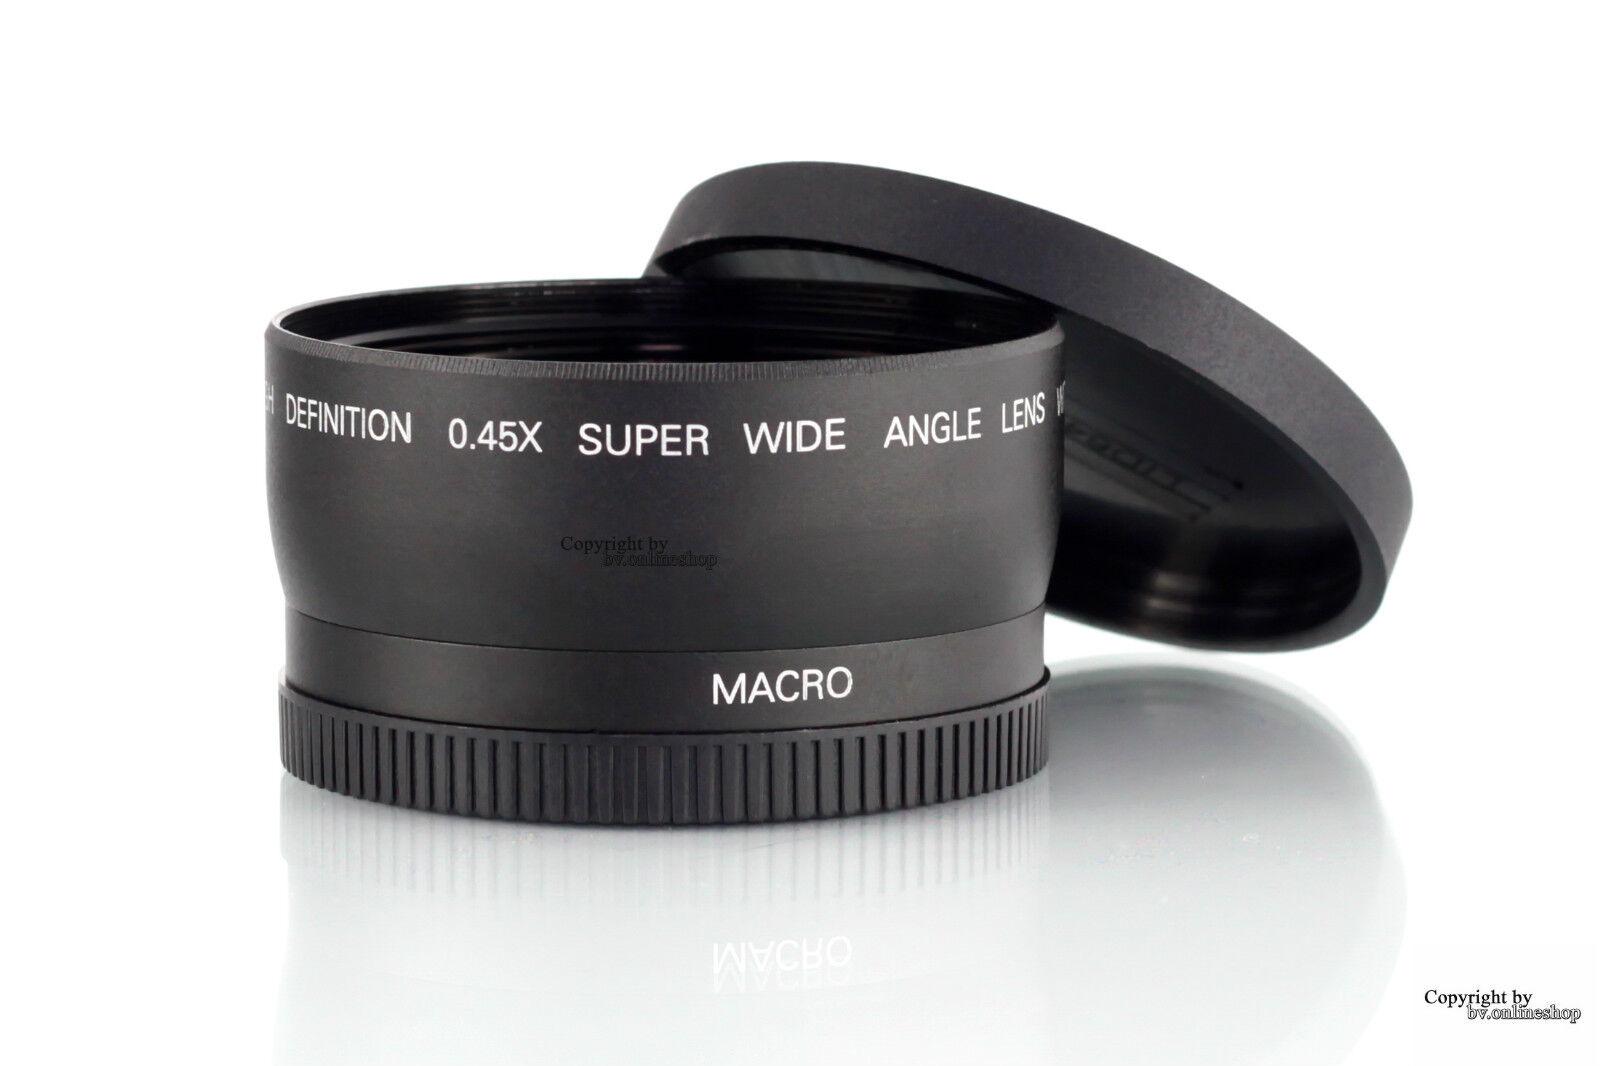 Objektiv Weitwinkel + Makro Canon EOS EF-S 18-55mm 58mm 60D 600D 650D 1200D DSLR